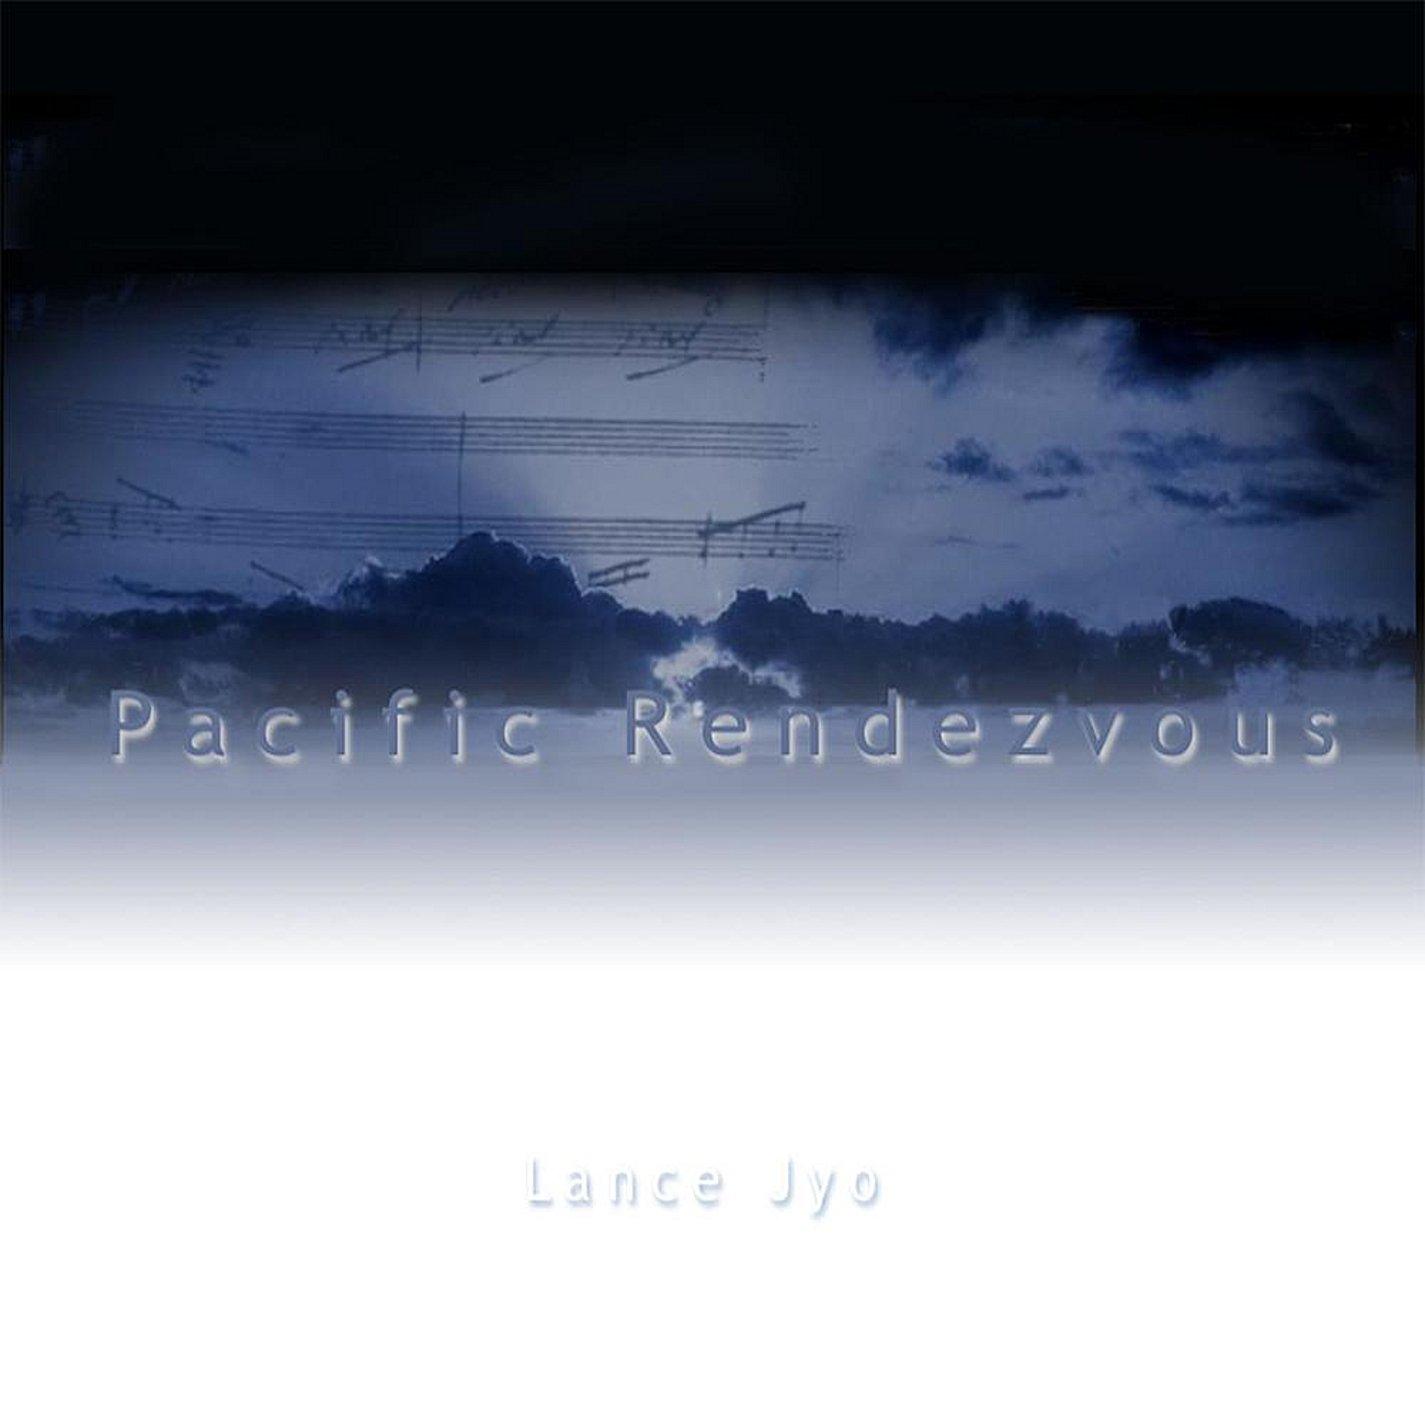 Pacific Rendevous